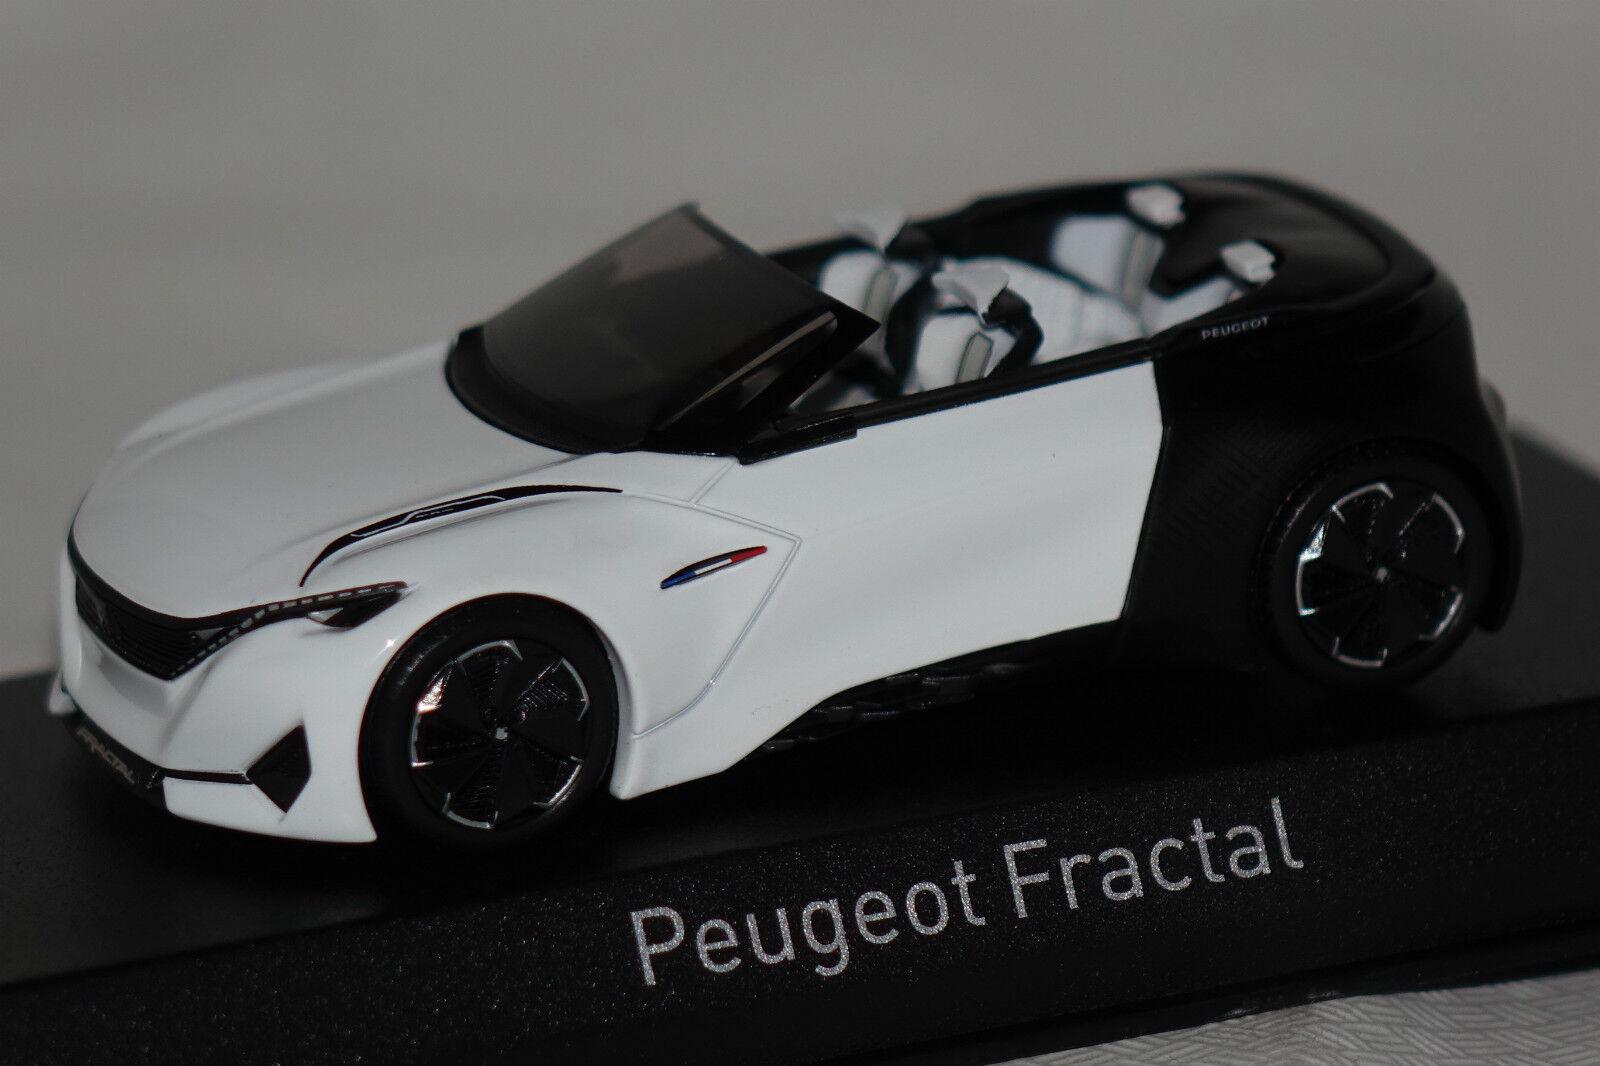 Peugeot Concept Car Fractal Cabrio Frankfurt 2015 1 43 Norev neu & OVP 479989